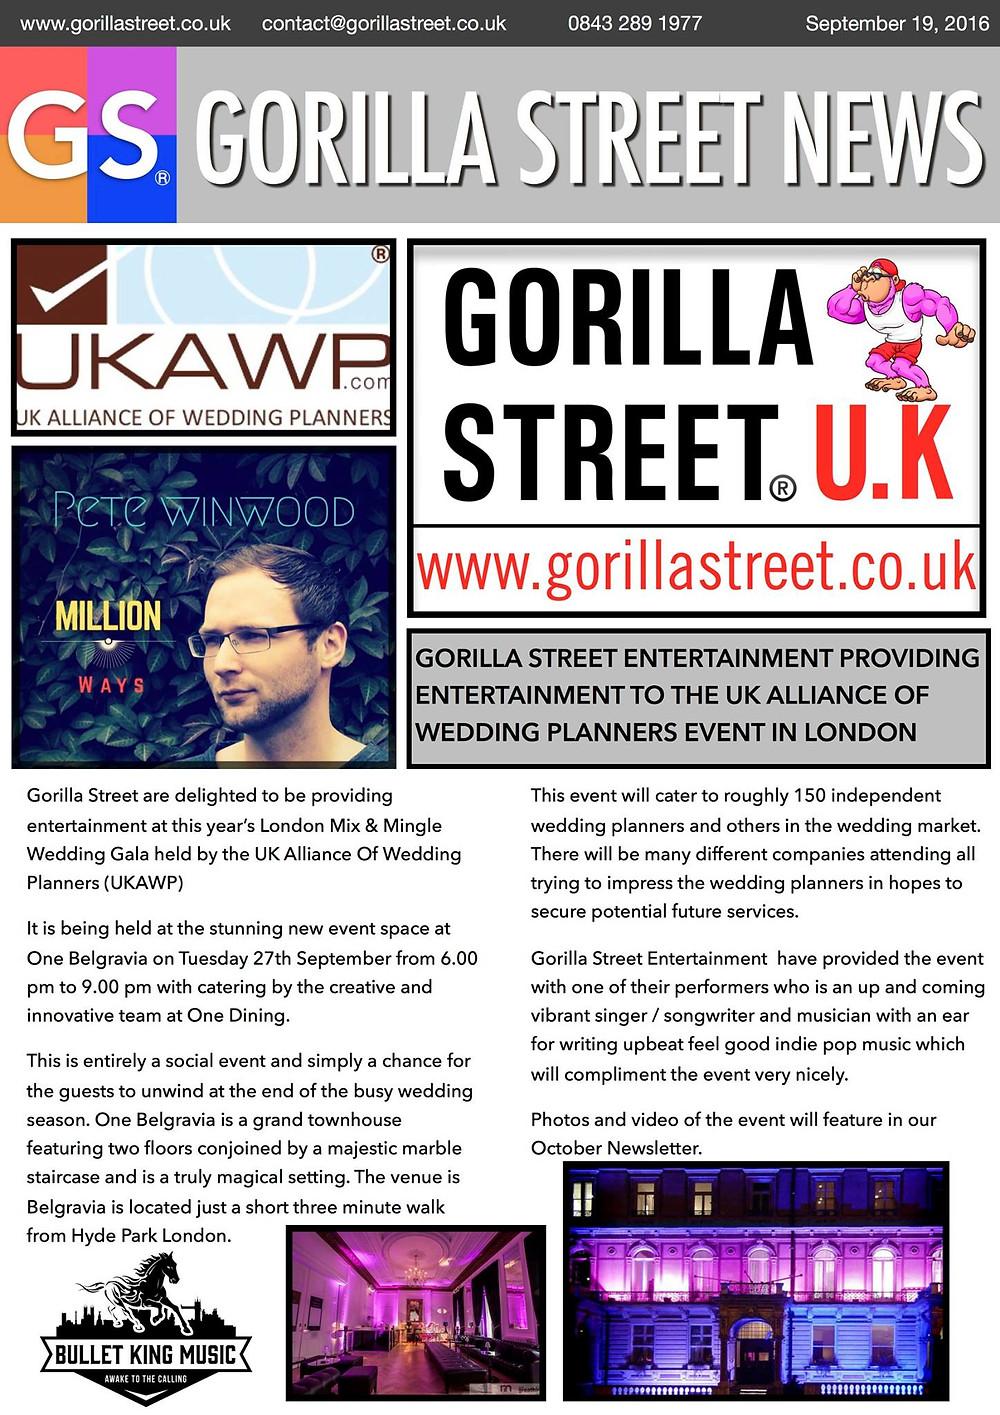 Gorilla Street News